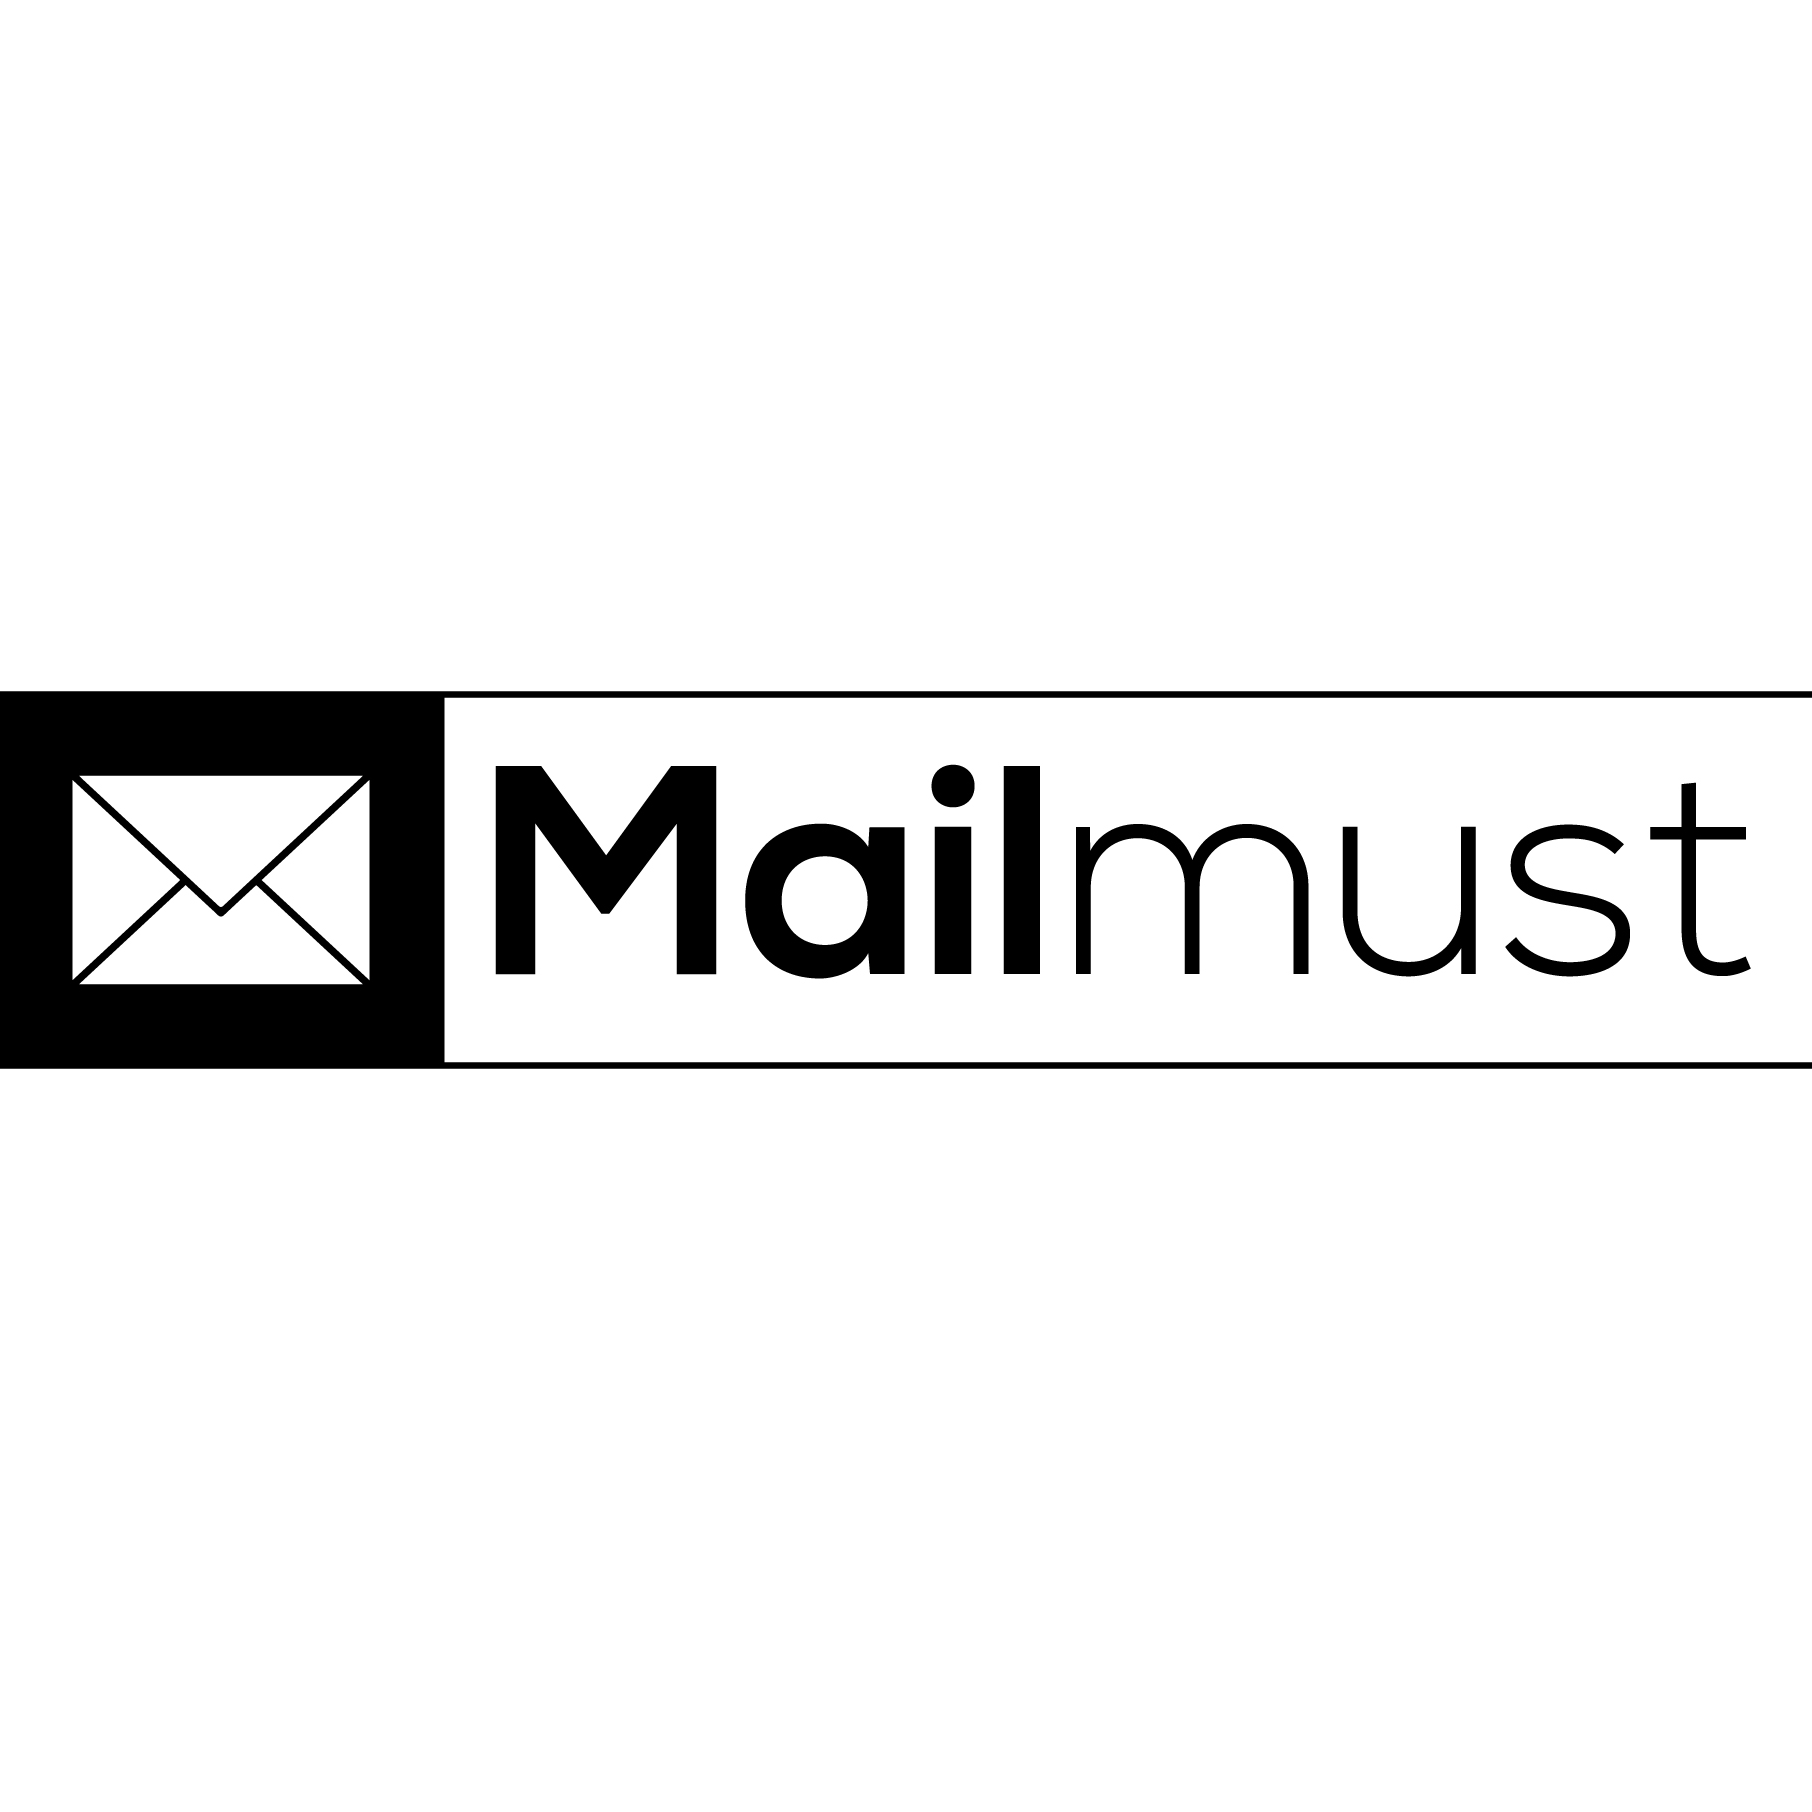 Mailmust